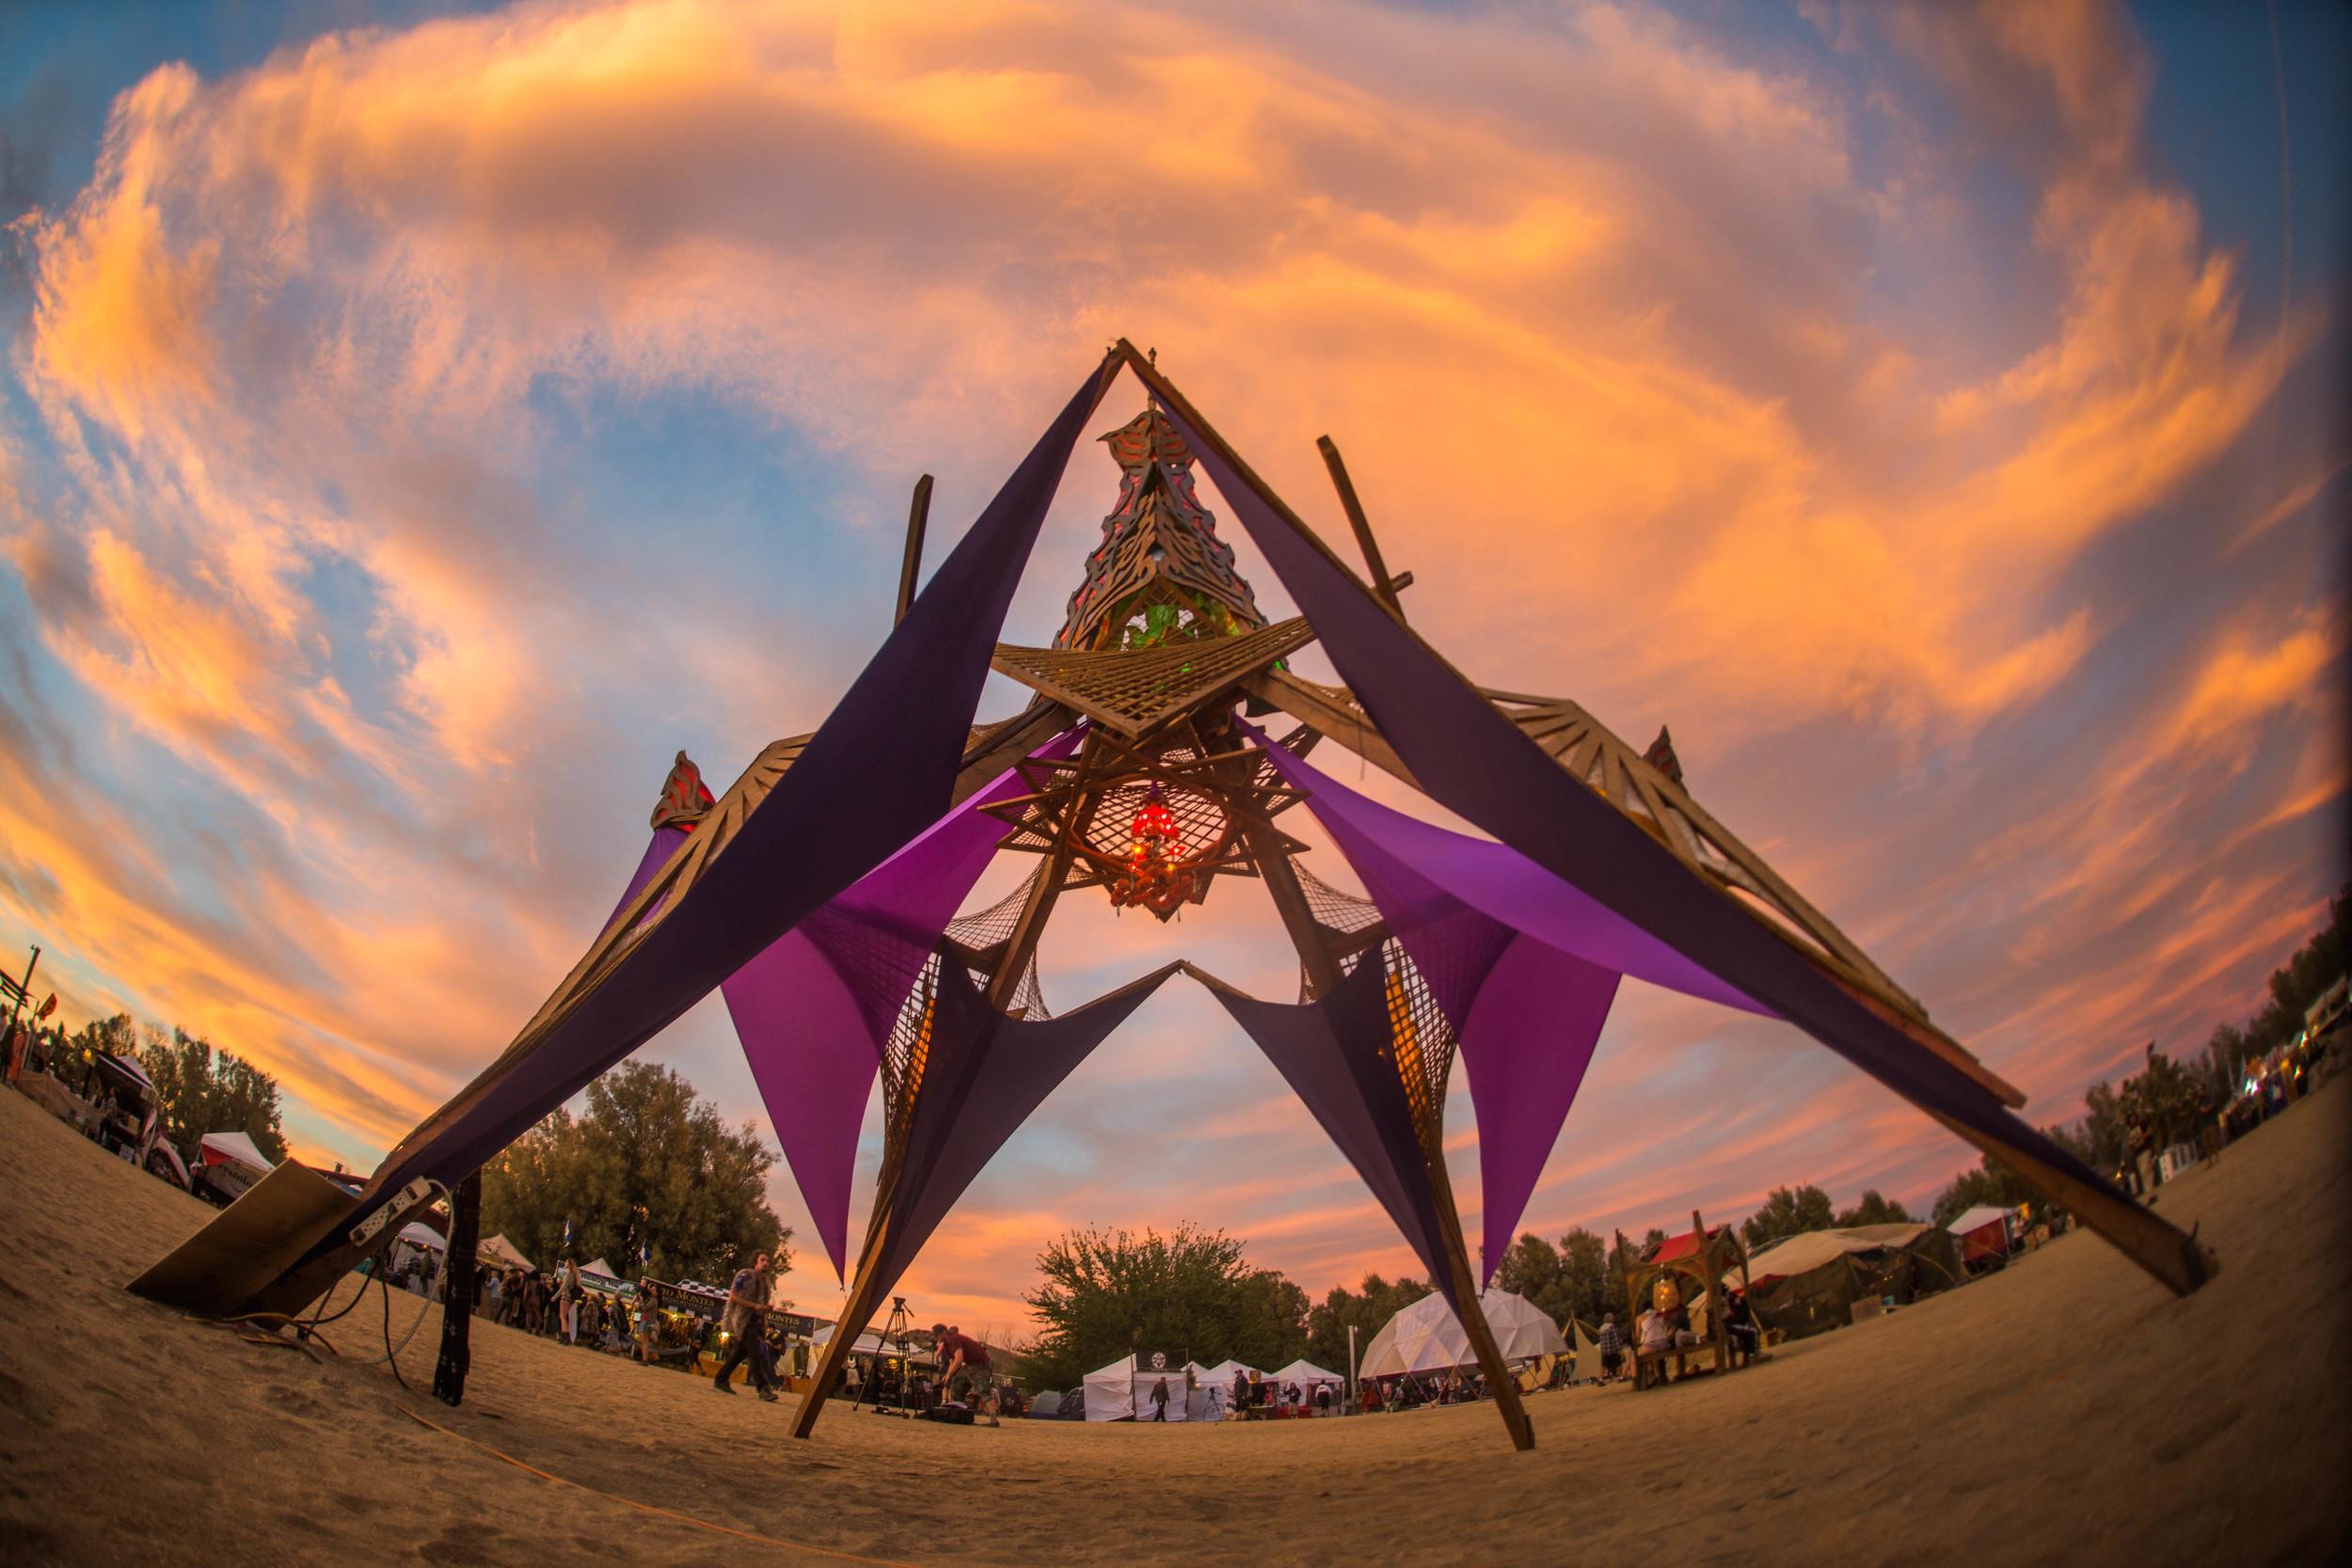 Serenity Gathering Music Festival (Joshua Tree National Park)